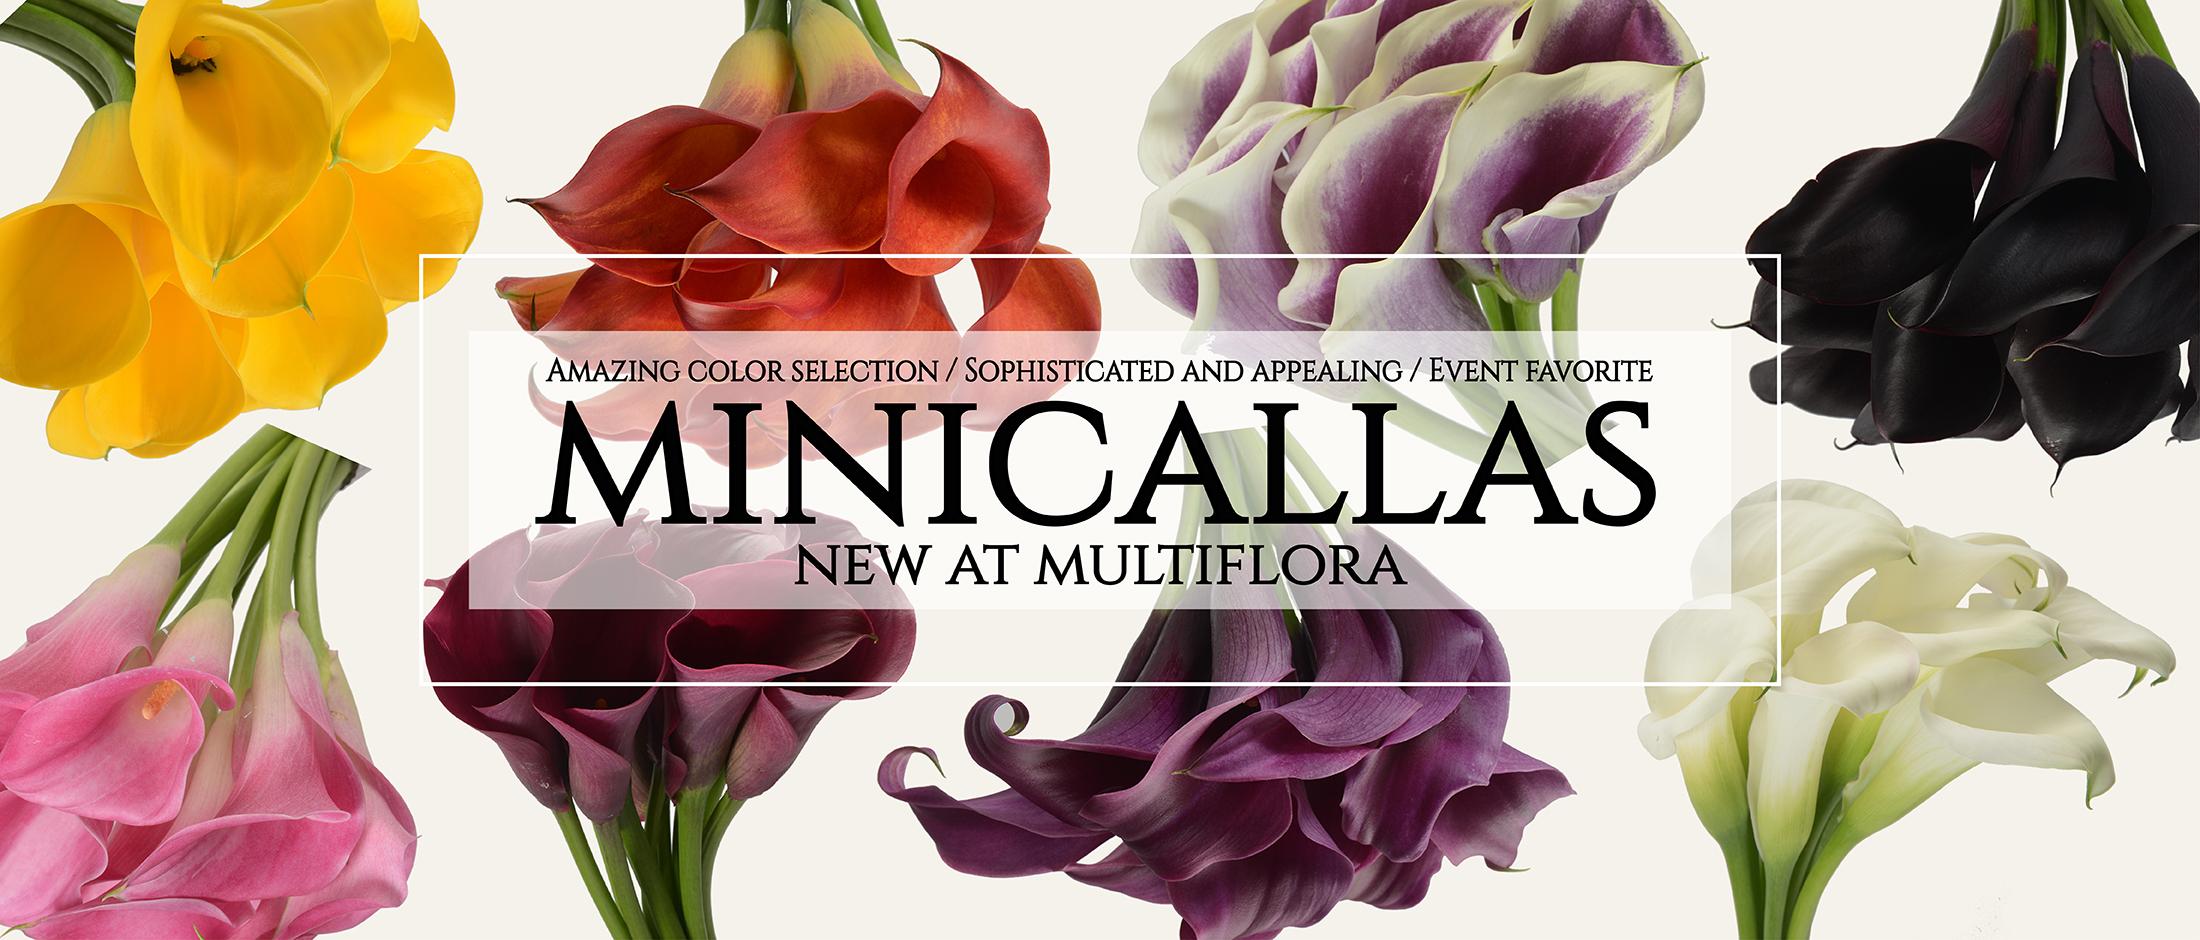 MINICALLAS-01-01-01-03-03-03